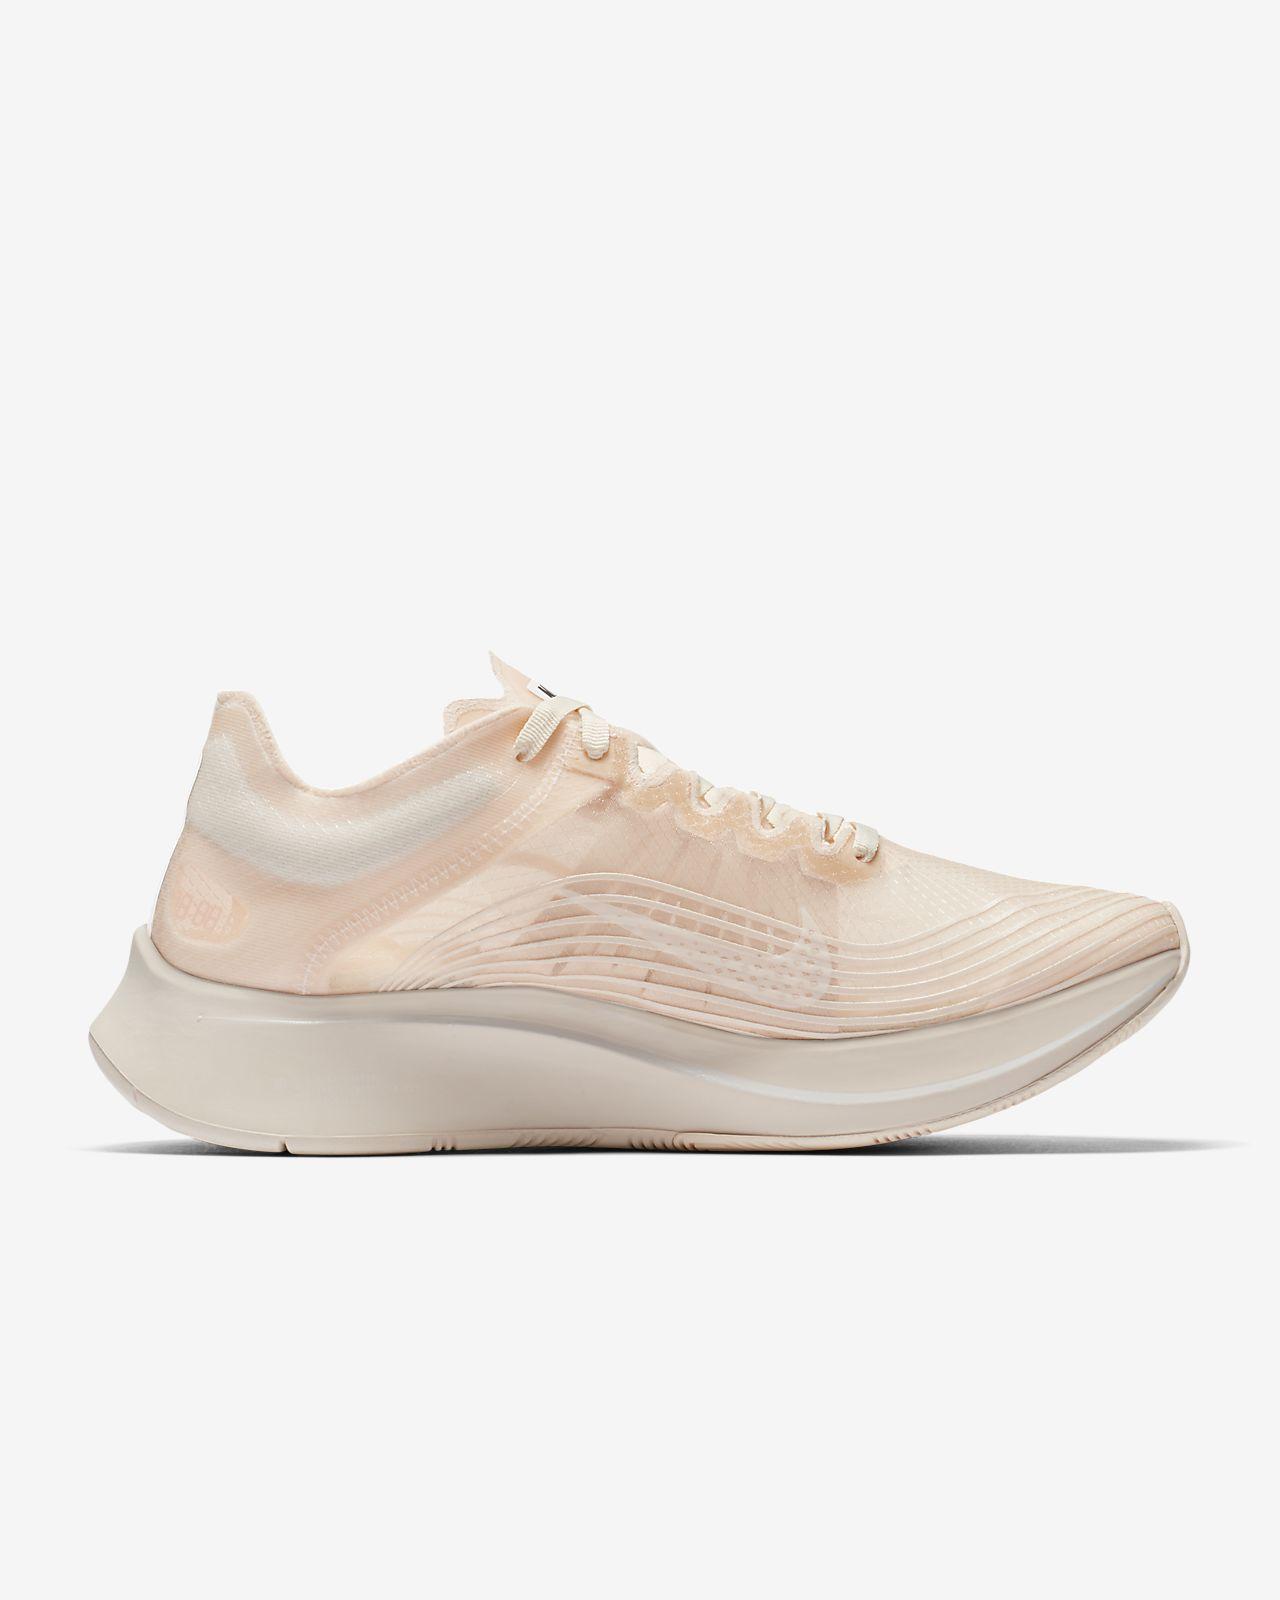 b48c7e78fd0f5 Nike Zoom Fly SP Women's Running Shoe